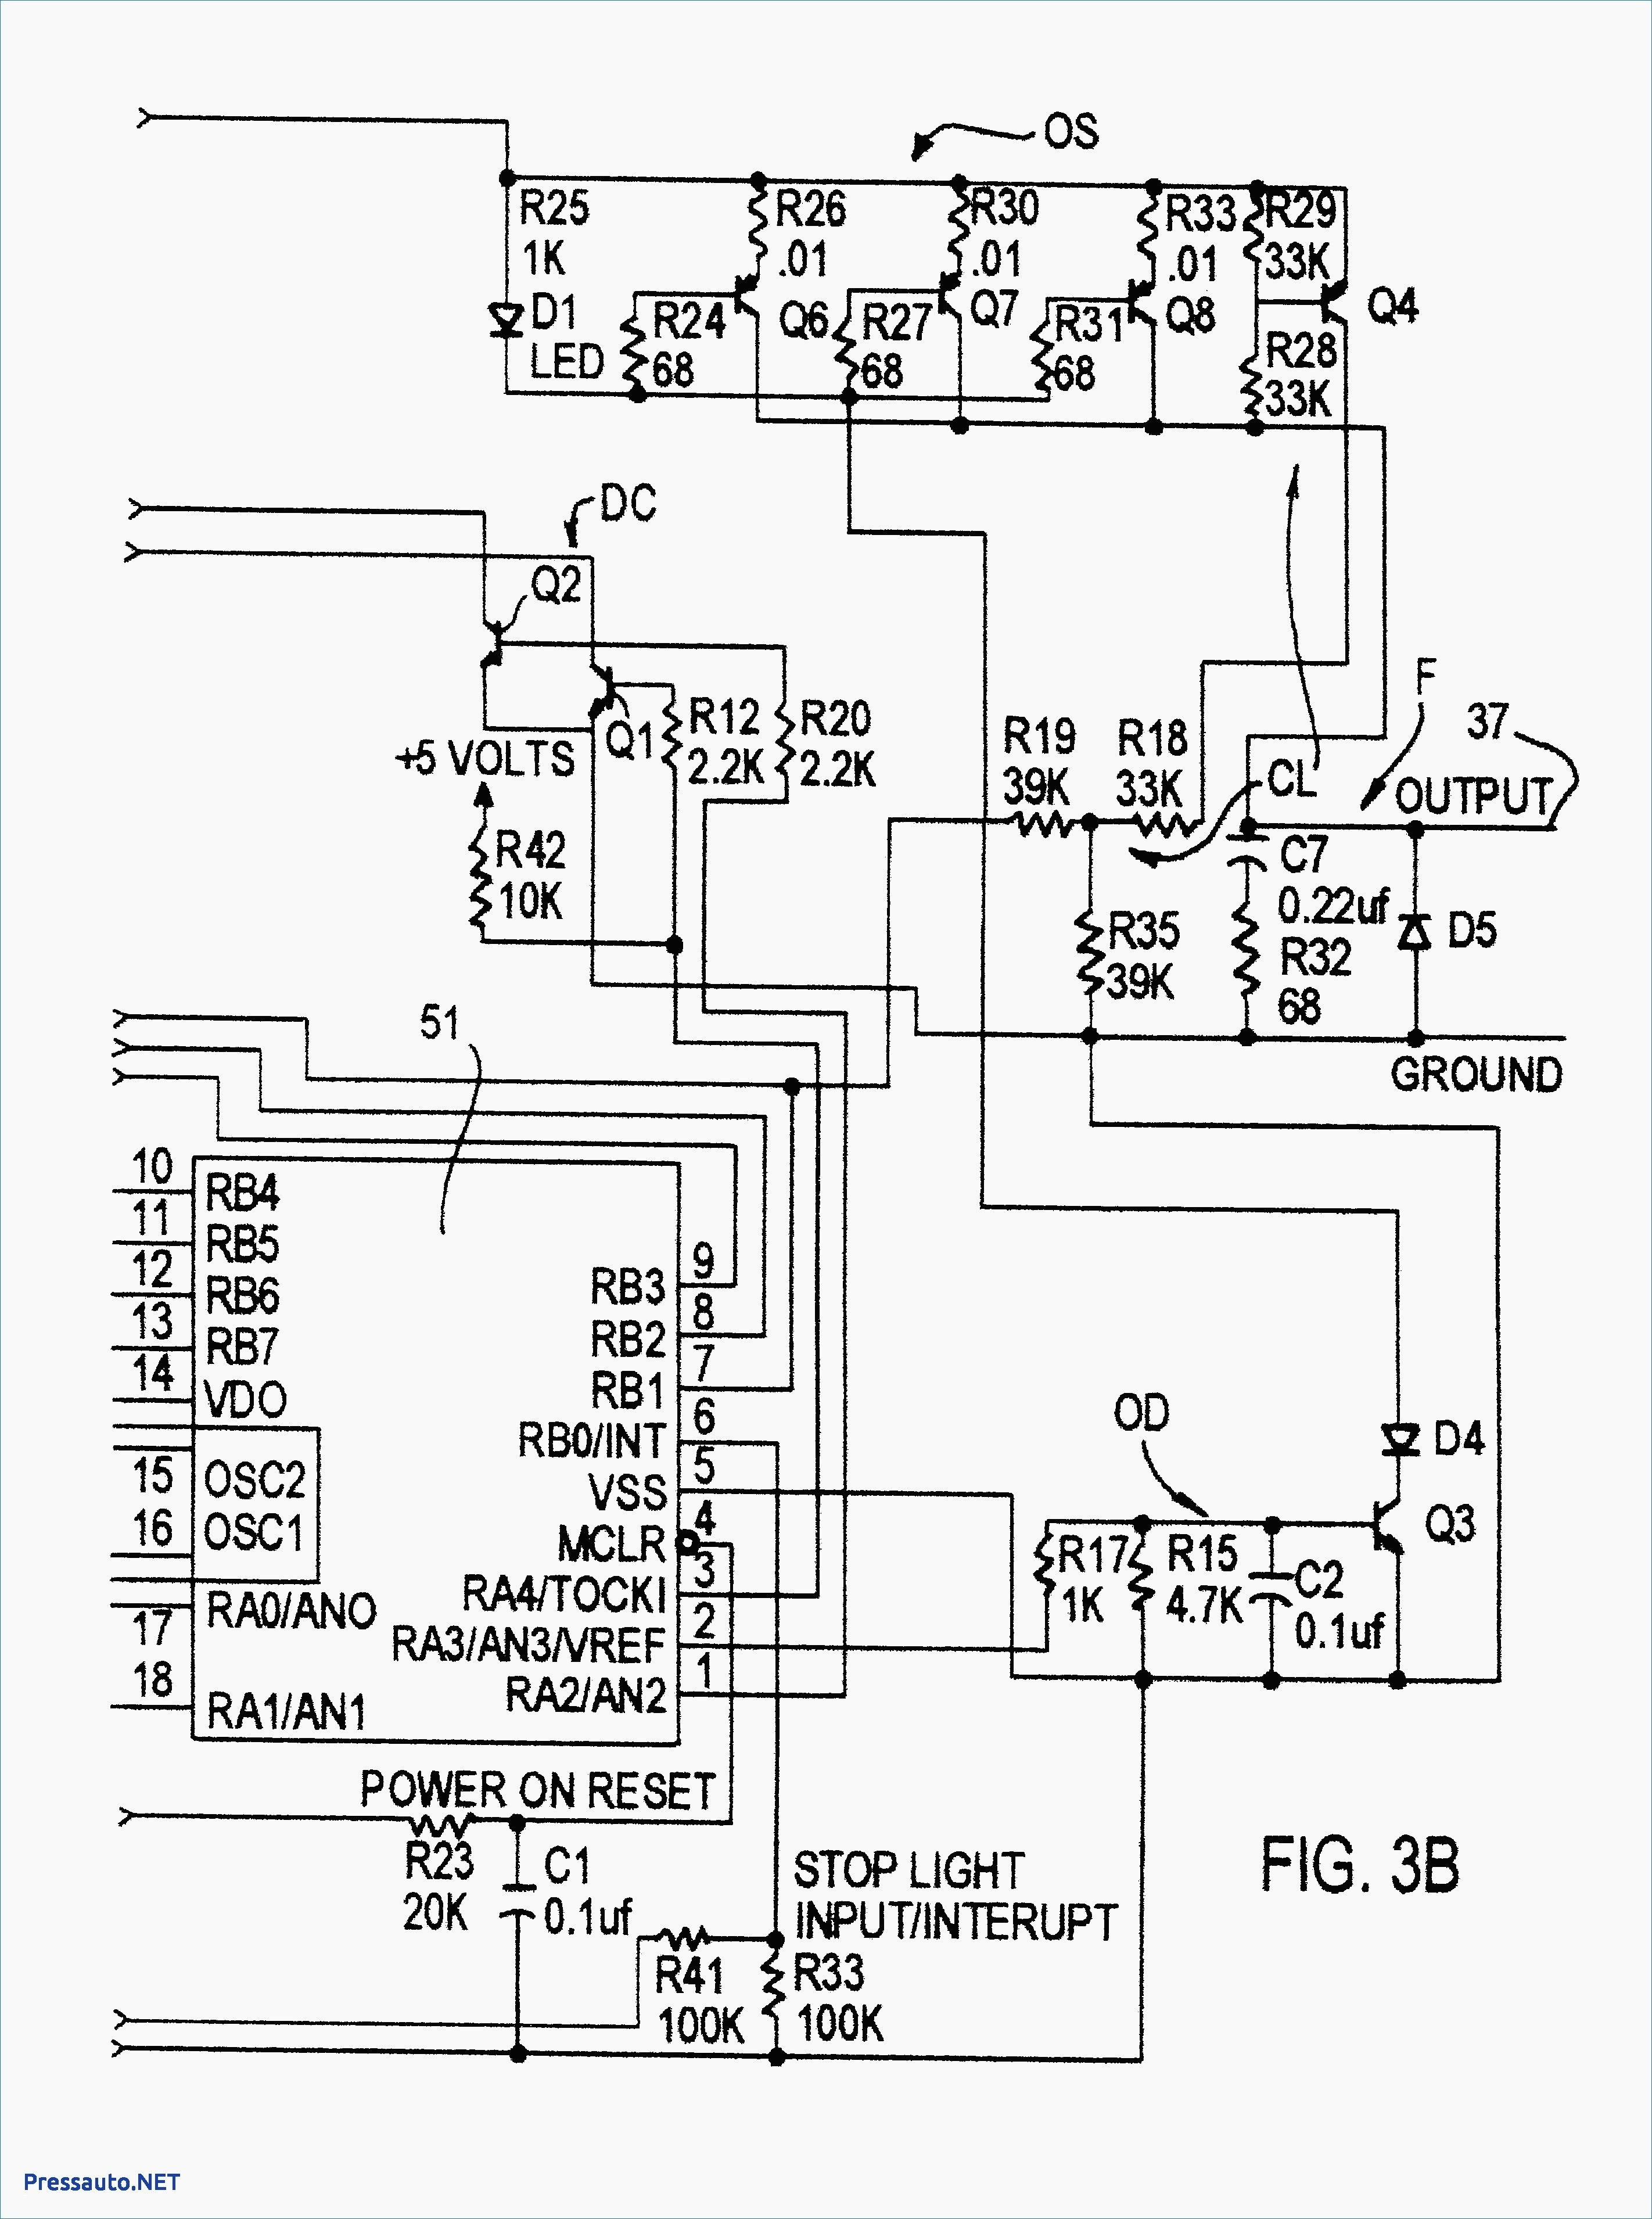 Cucv Wiring Diagram Detailed Schematics Glow Plug Elegant Image 1997 Chevrolet Blazer Auto Meter Diagrams